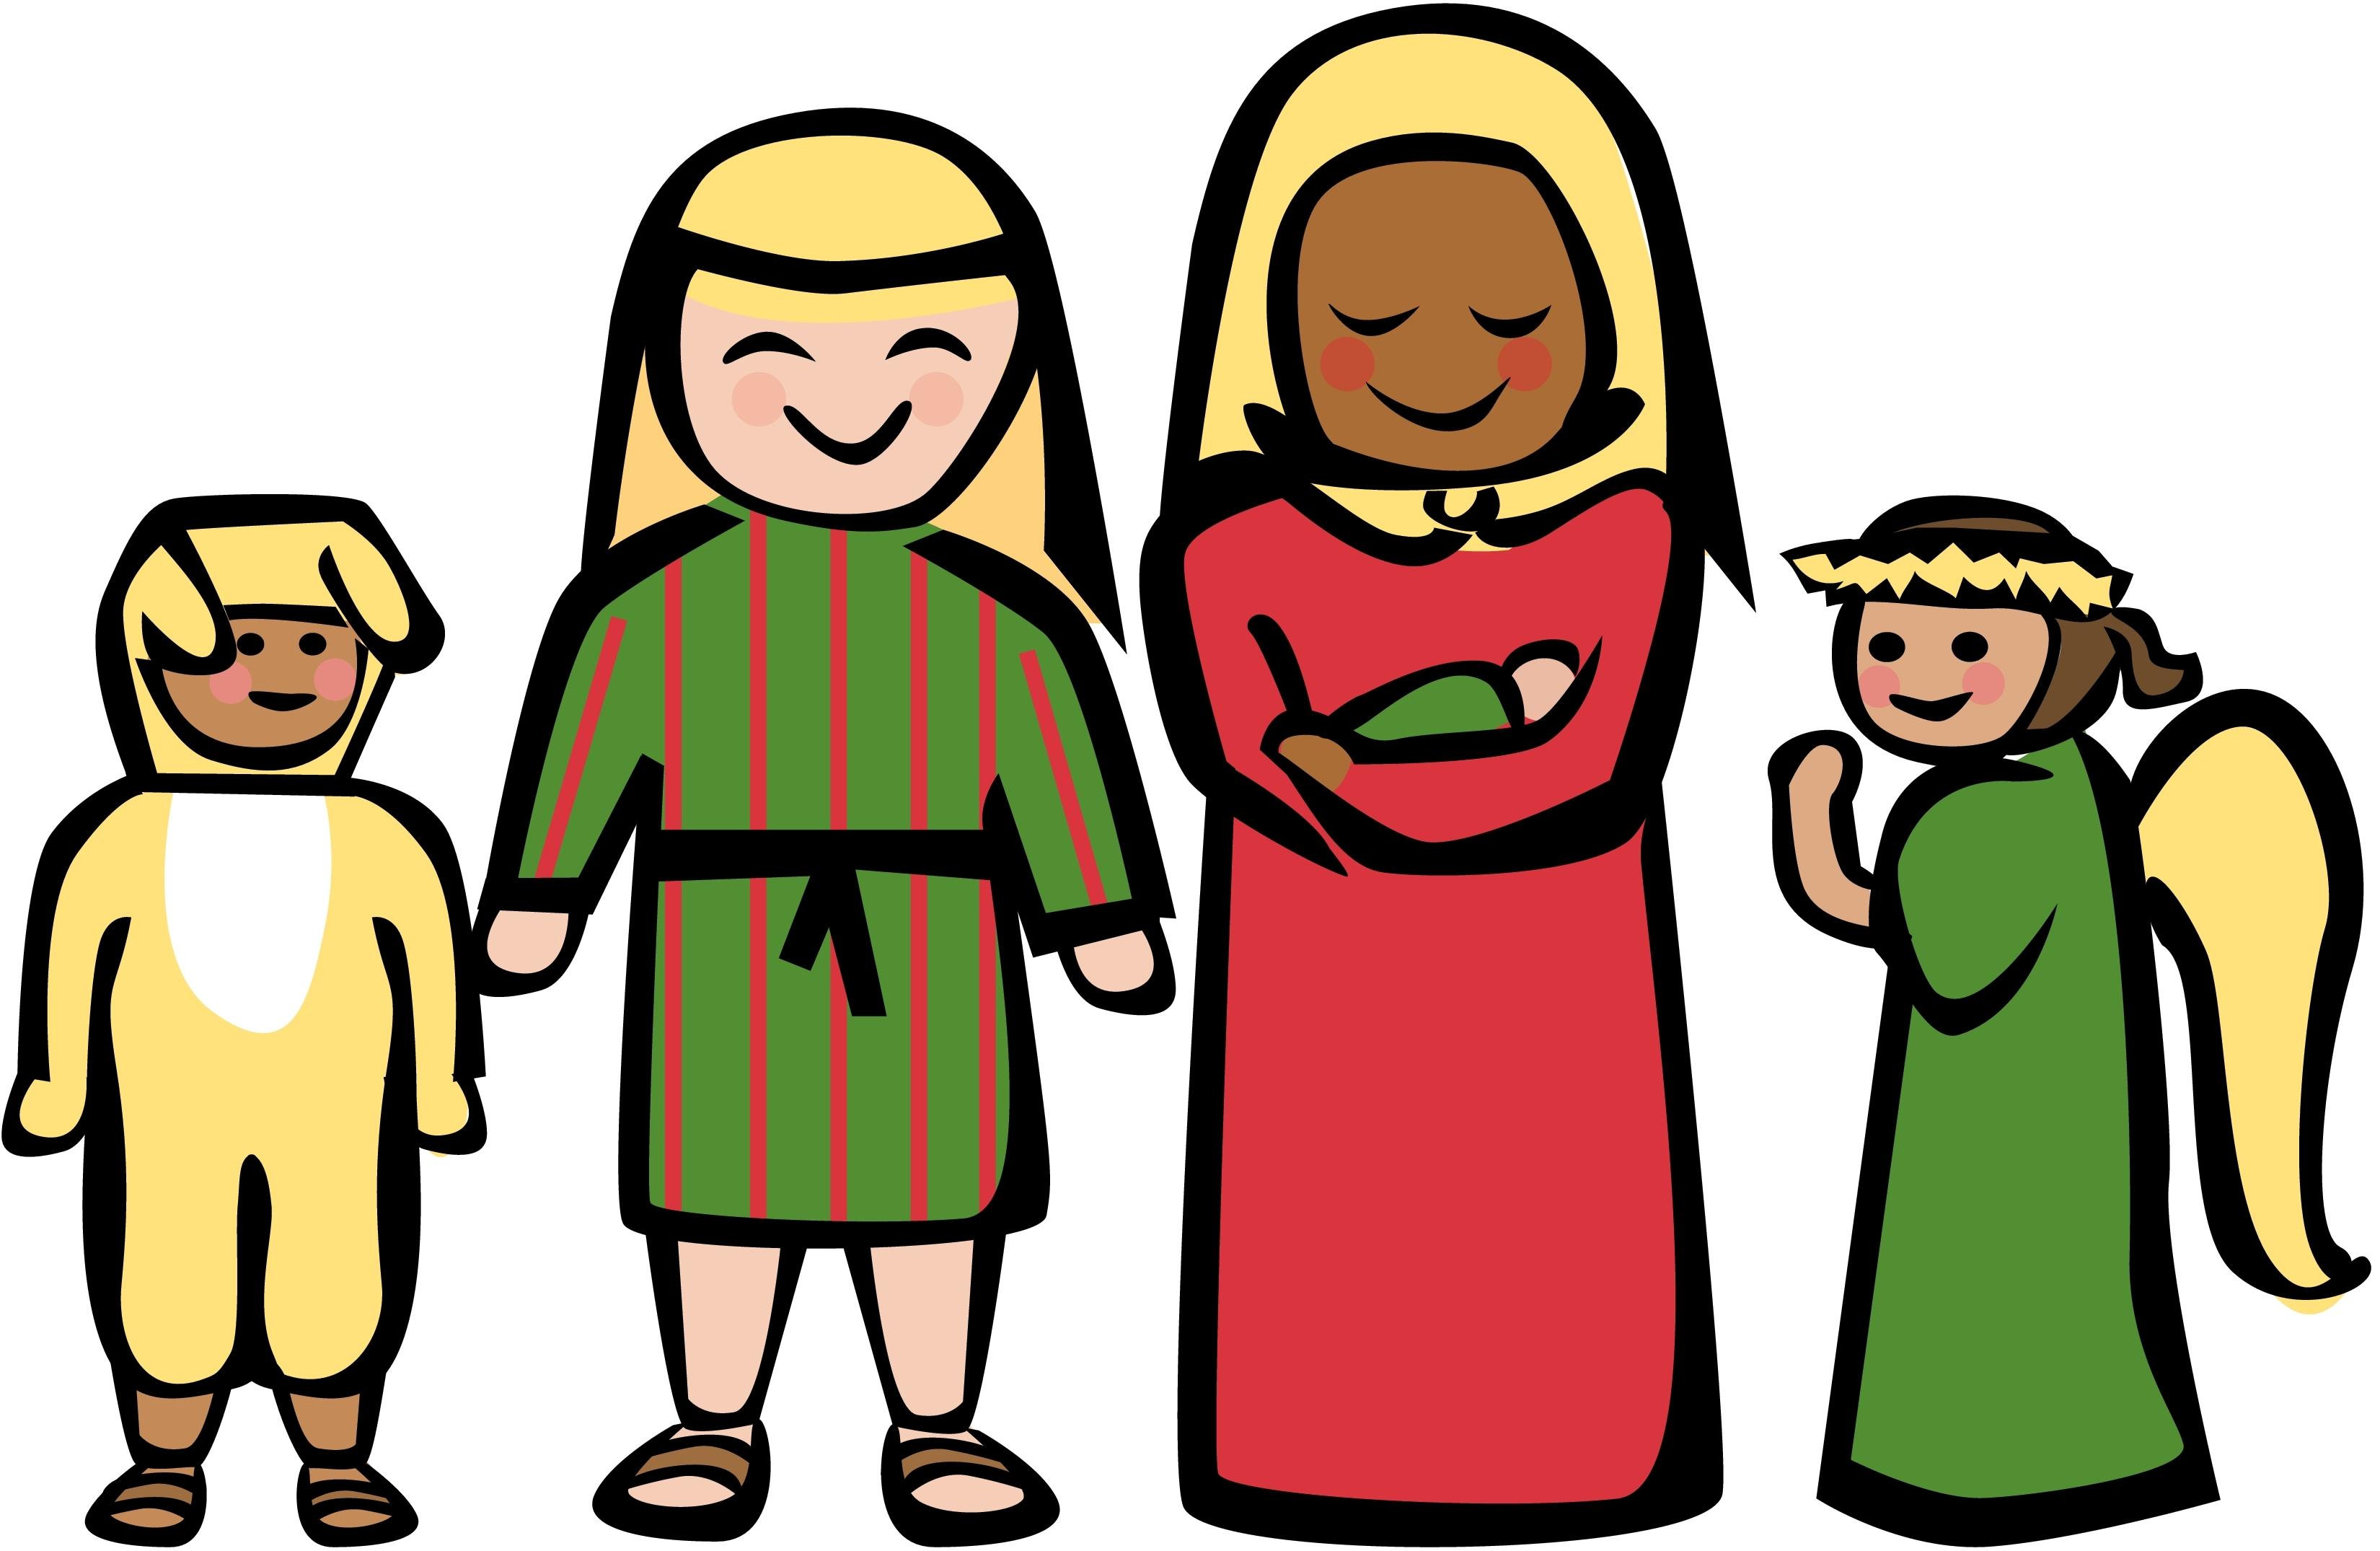 Free catholic christmas clipart graphic library library Free Catholic Christmas Cliparts, Download Free Clip Art, Free Clip ... graphic library library